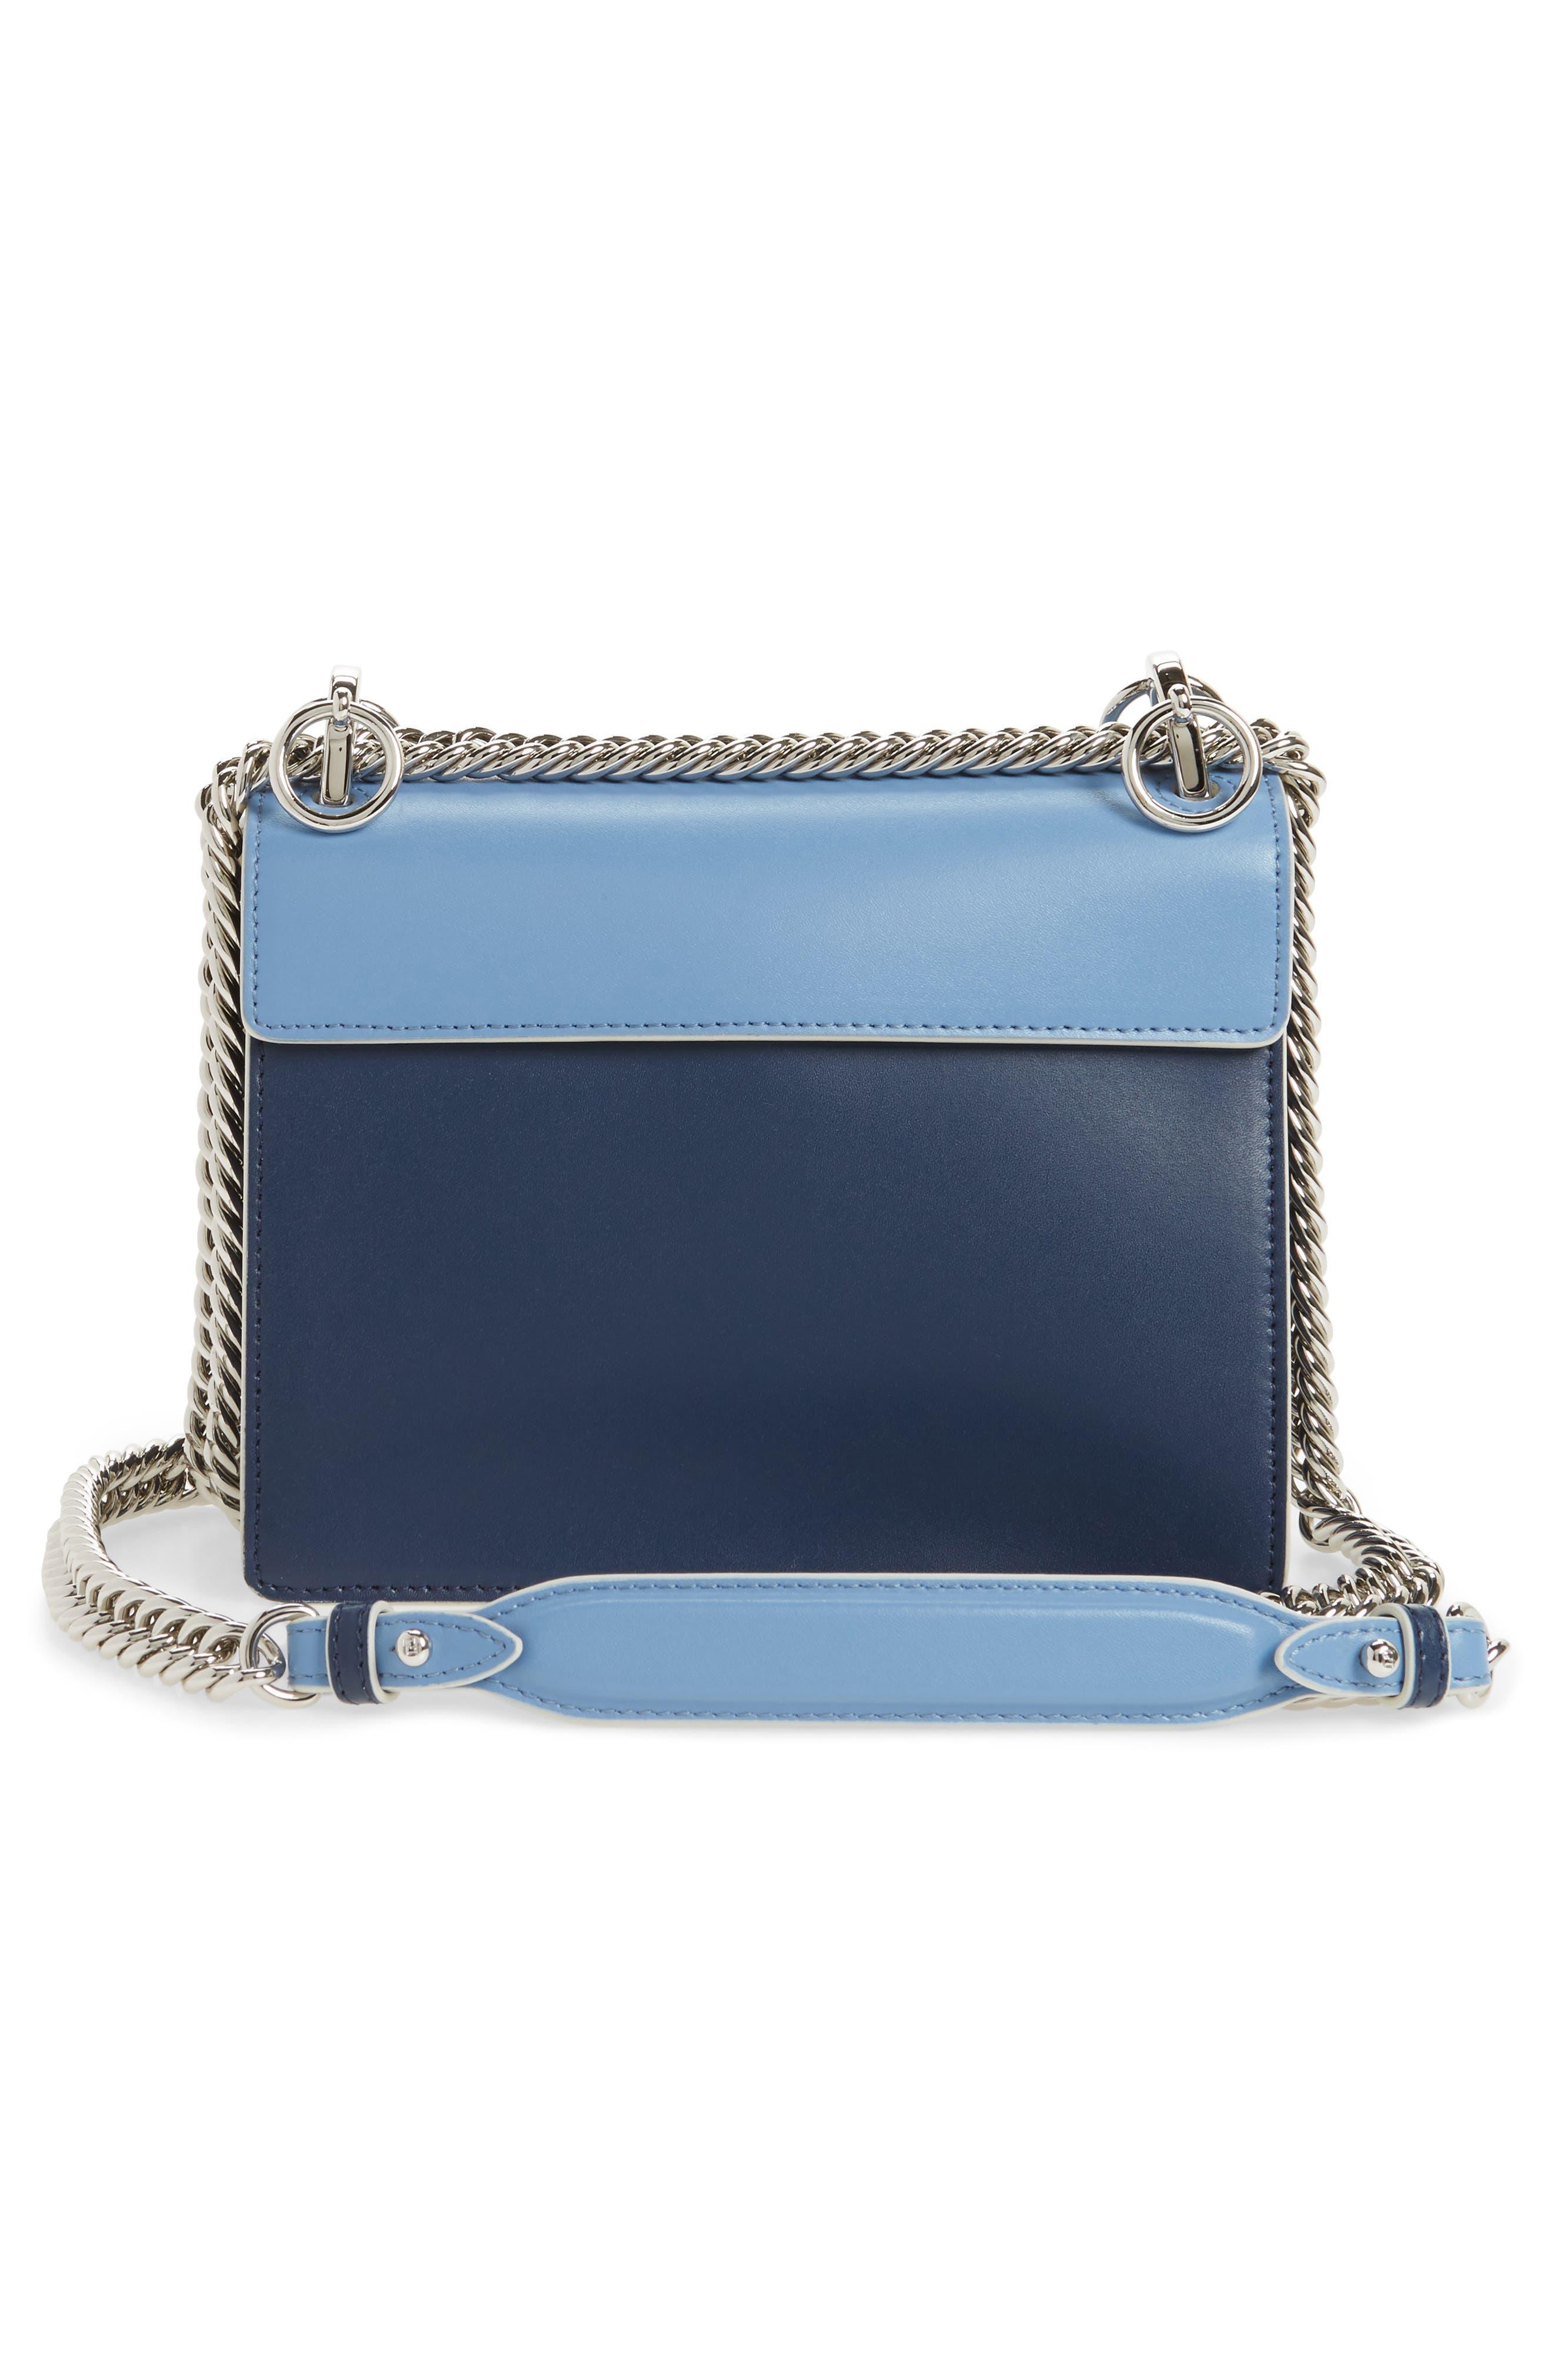 Mini Kan I Imitation Pearl Scallop Leather Shoulder Bag,                             Alternate thumbnail 3, color,                             BLUE